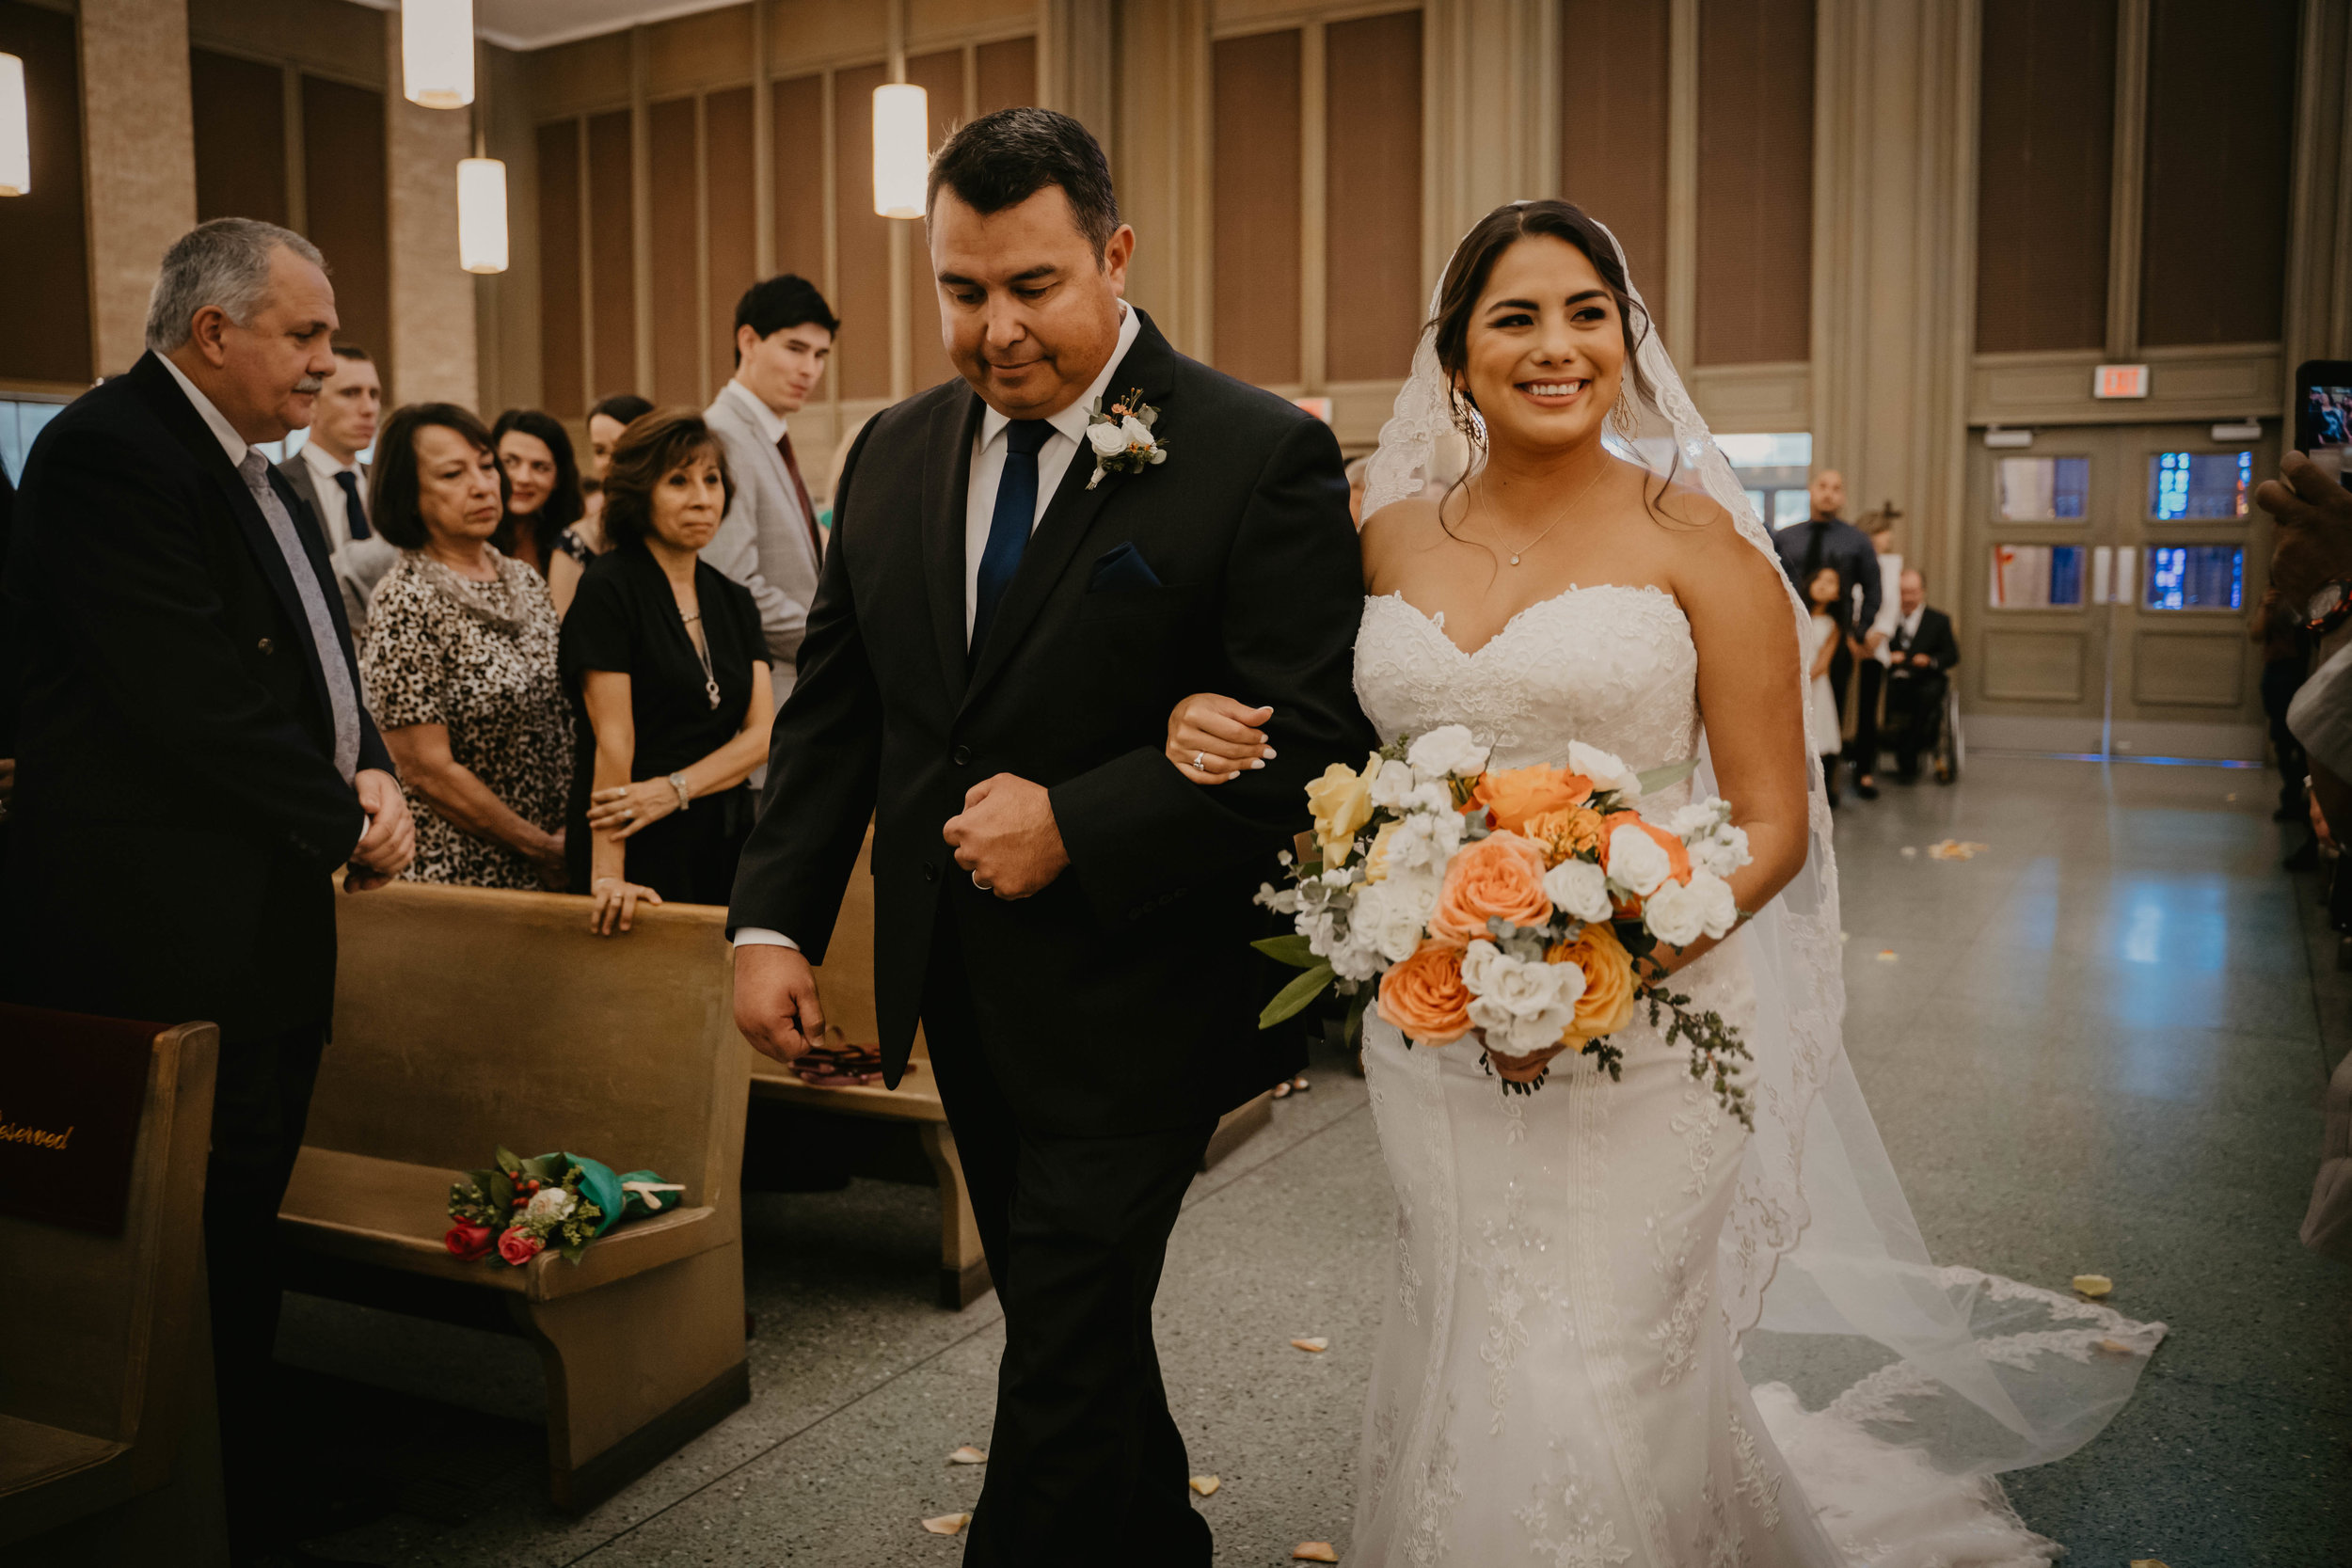 austin-wedding-videographer (23 of 999).jpg